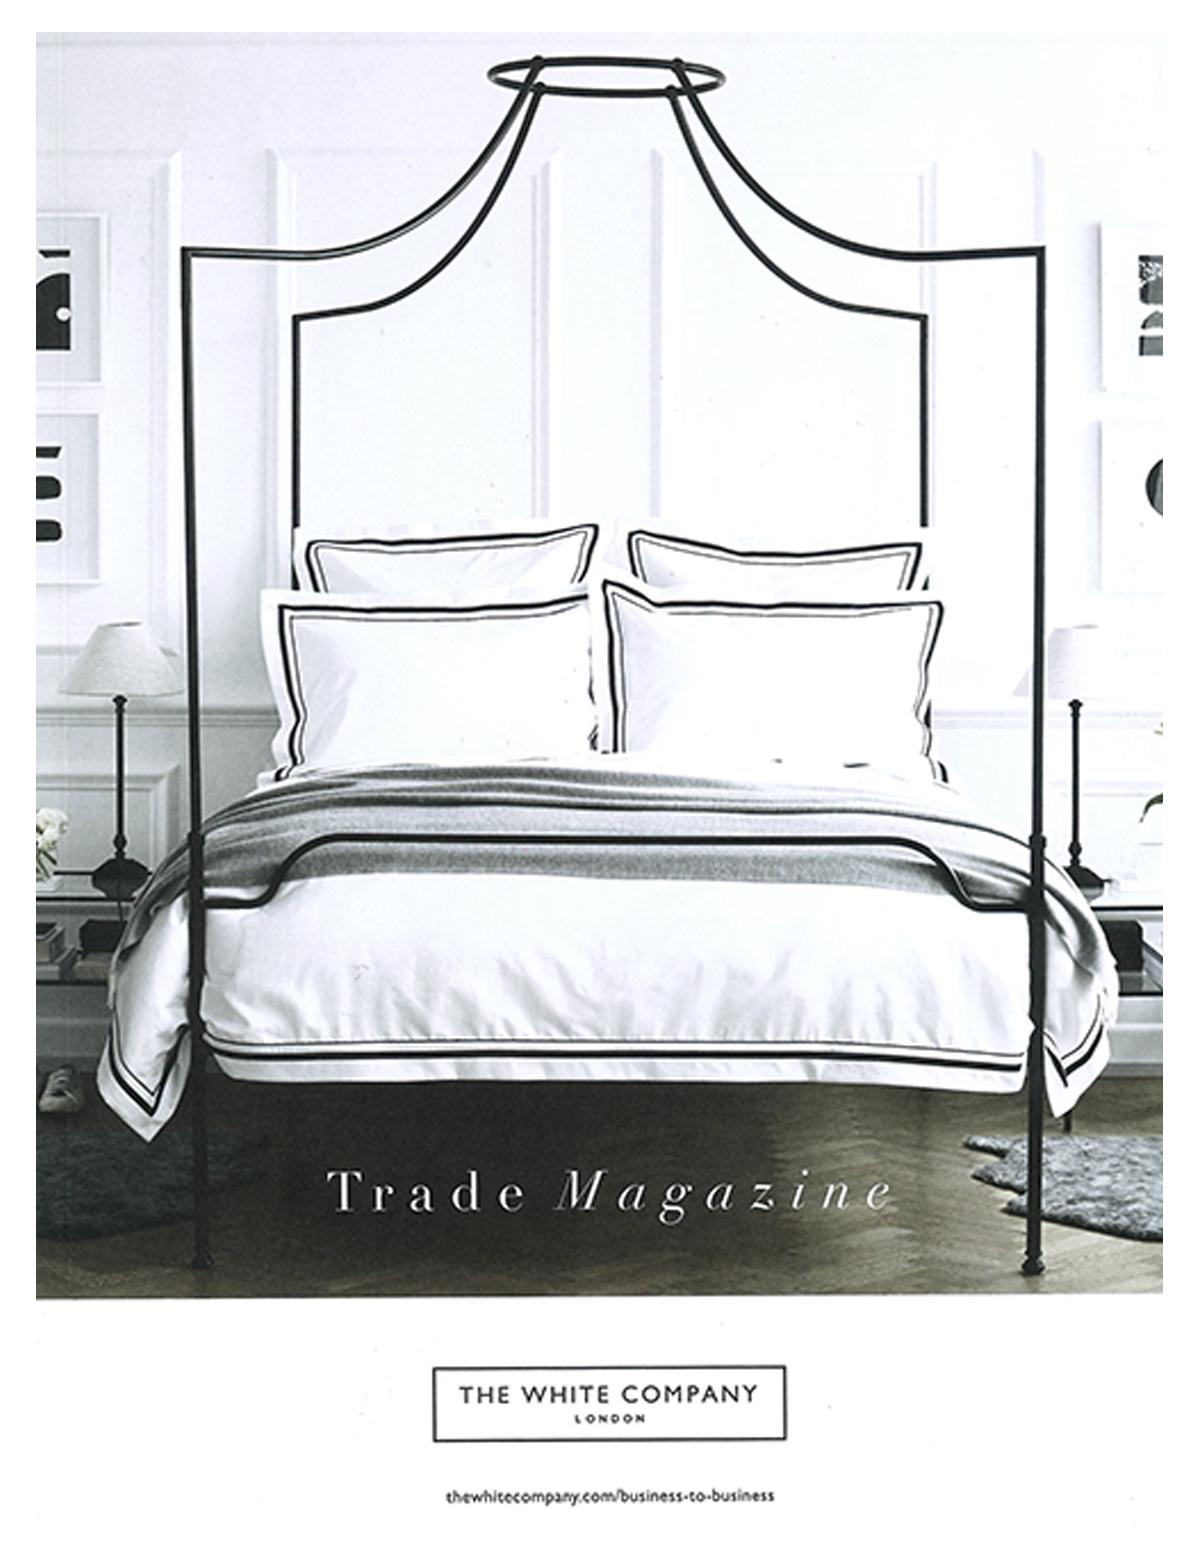 whitecompany-th2designs-cover.jpg